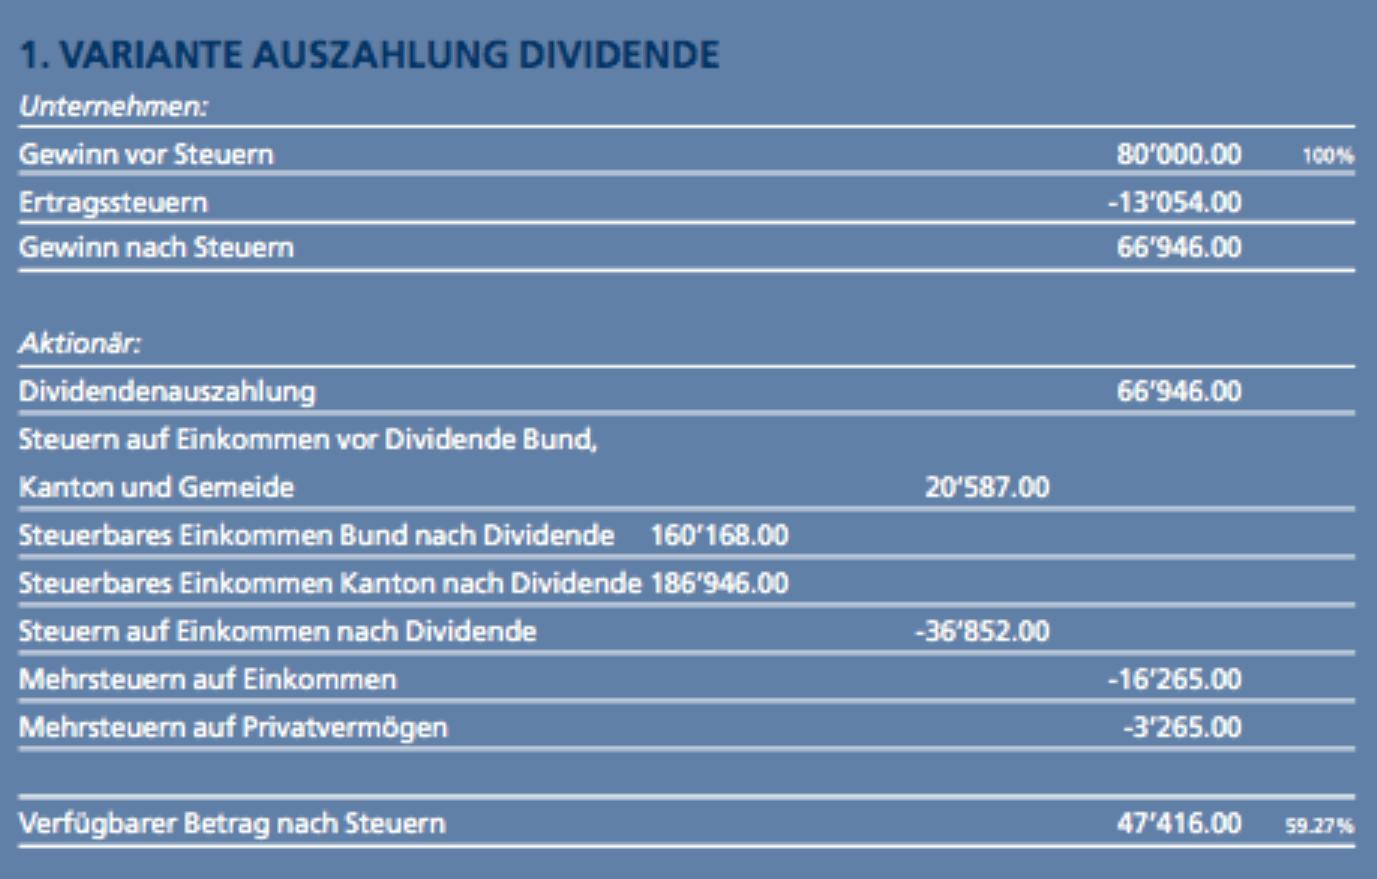 Publikation 1. Variante Auszahlung Dividende